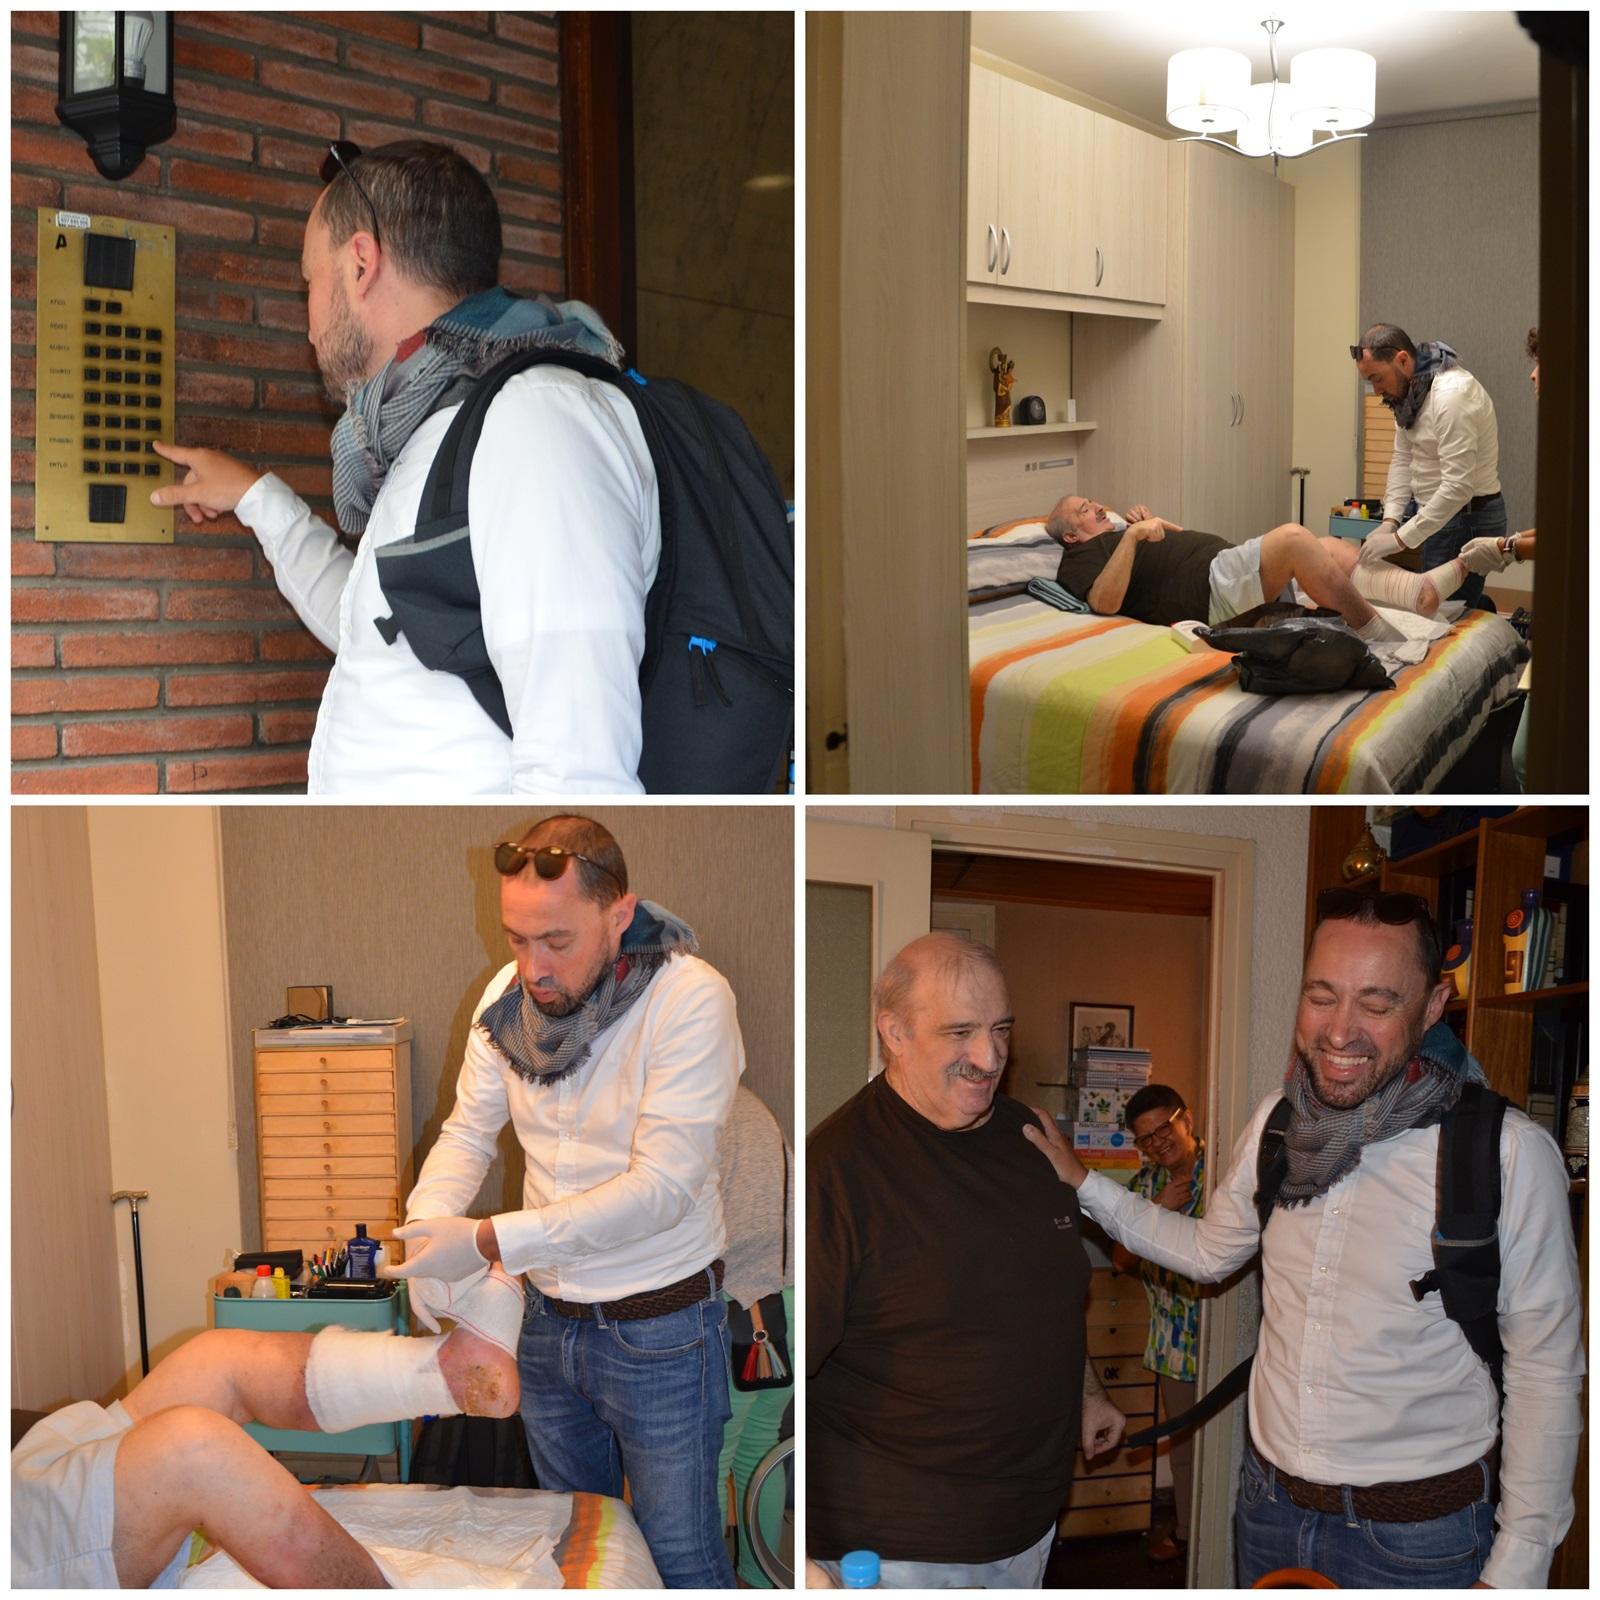 Dos infermers de Barcelona funden DUI'S, un negoci de serveis infermers a domicili